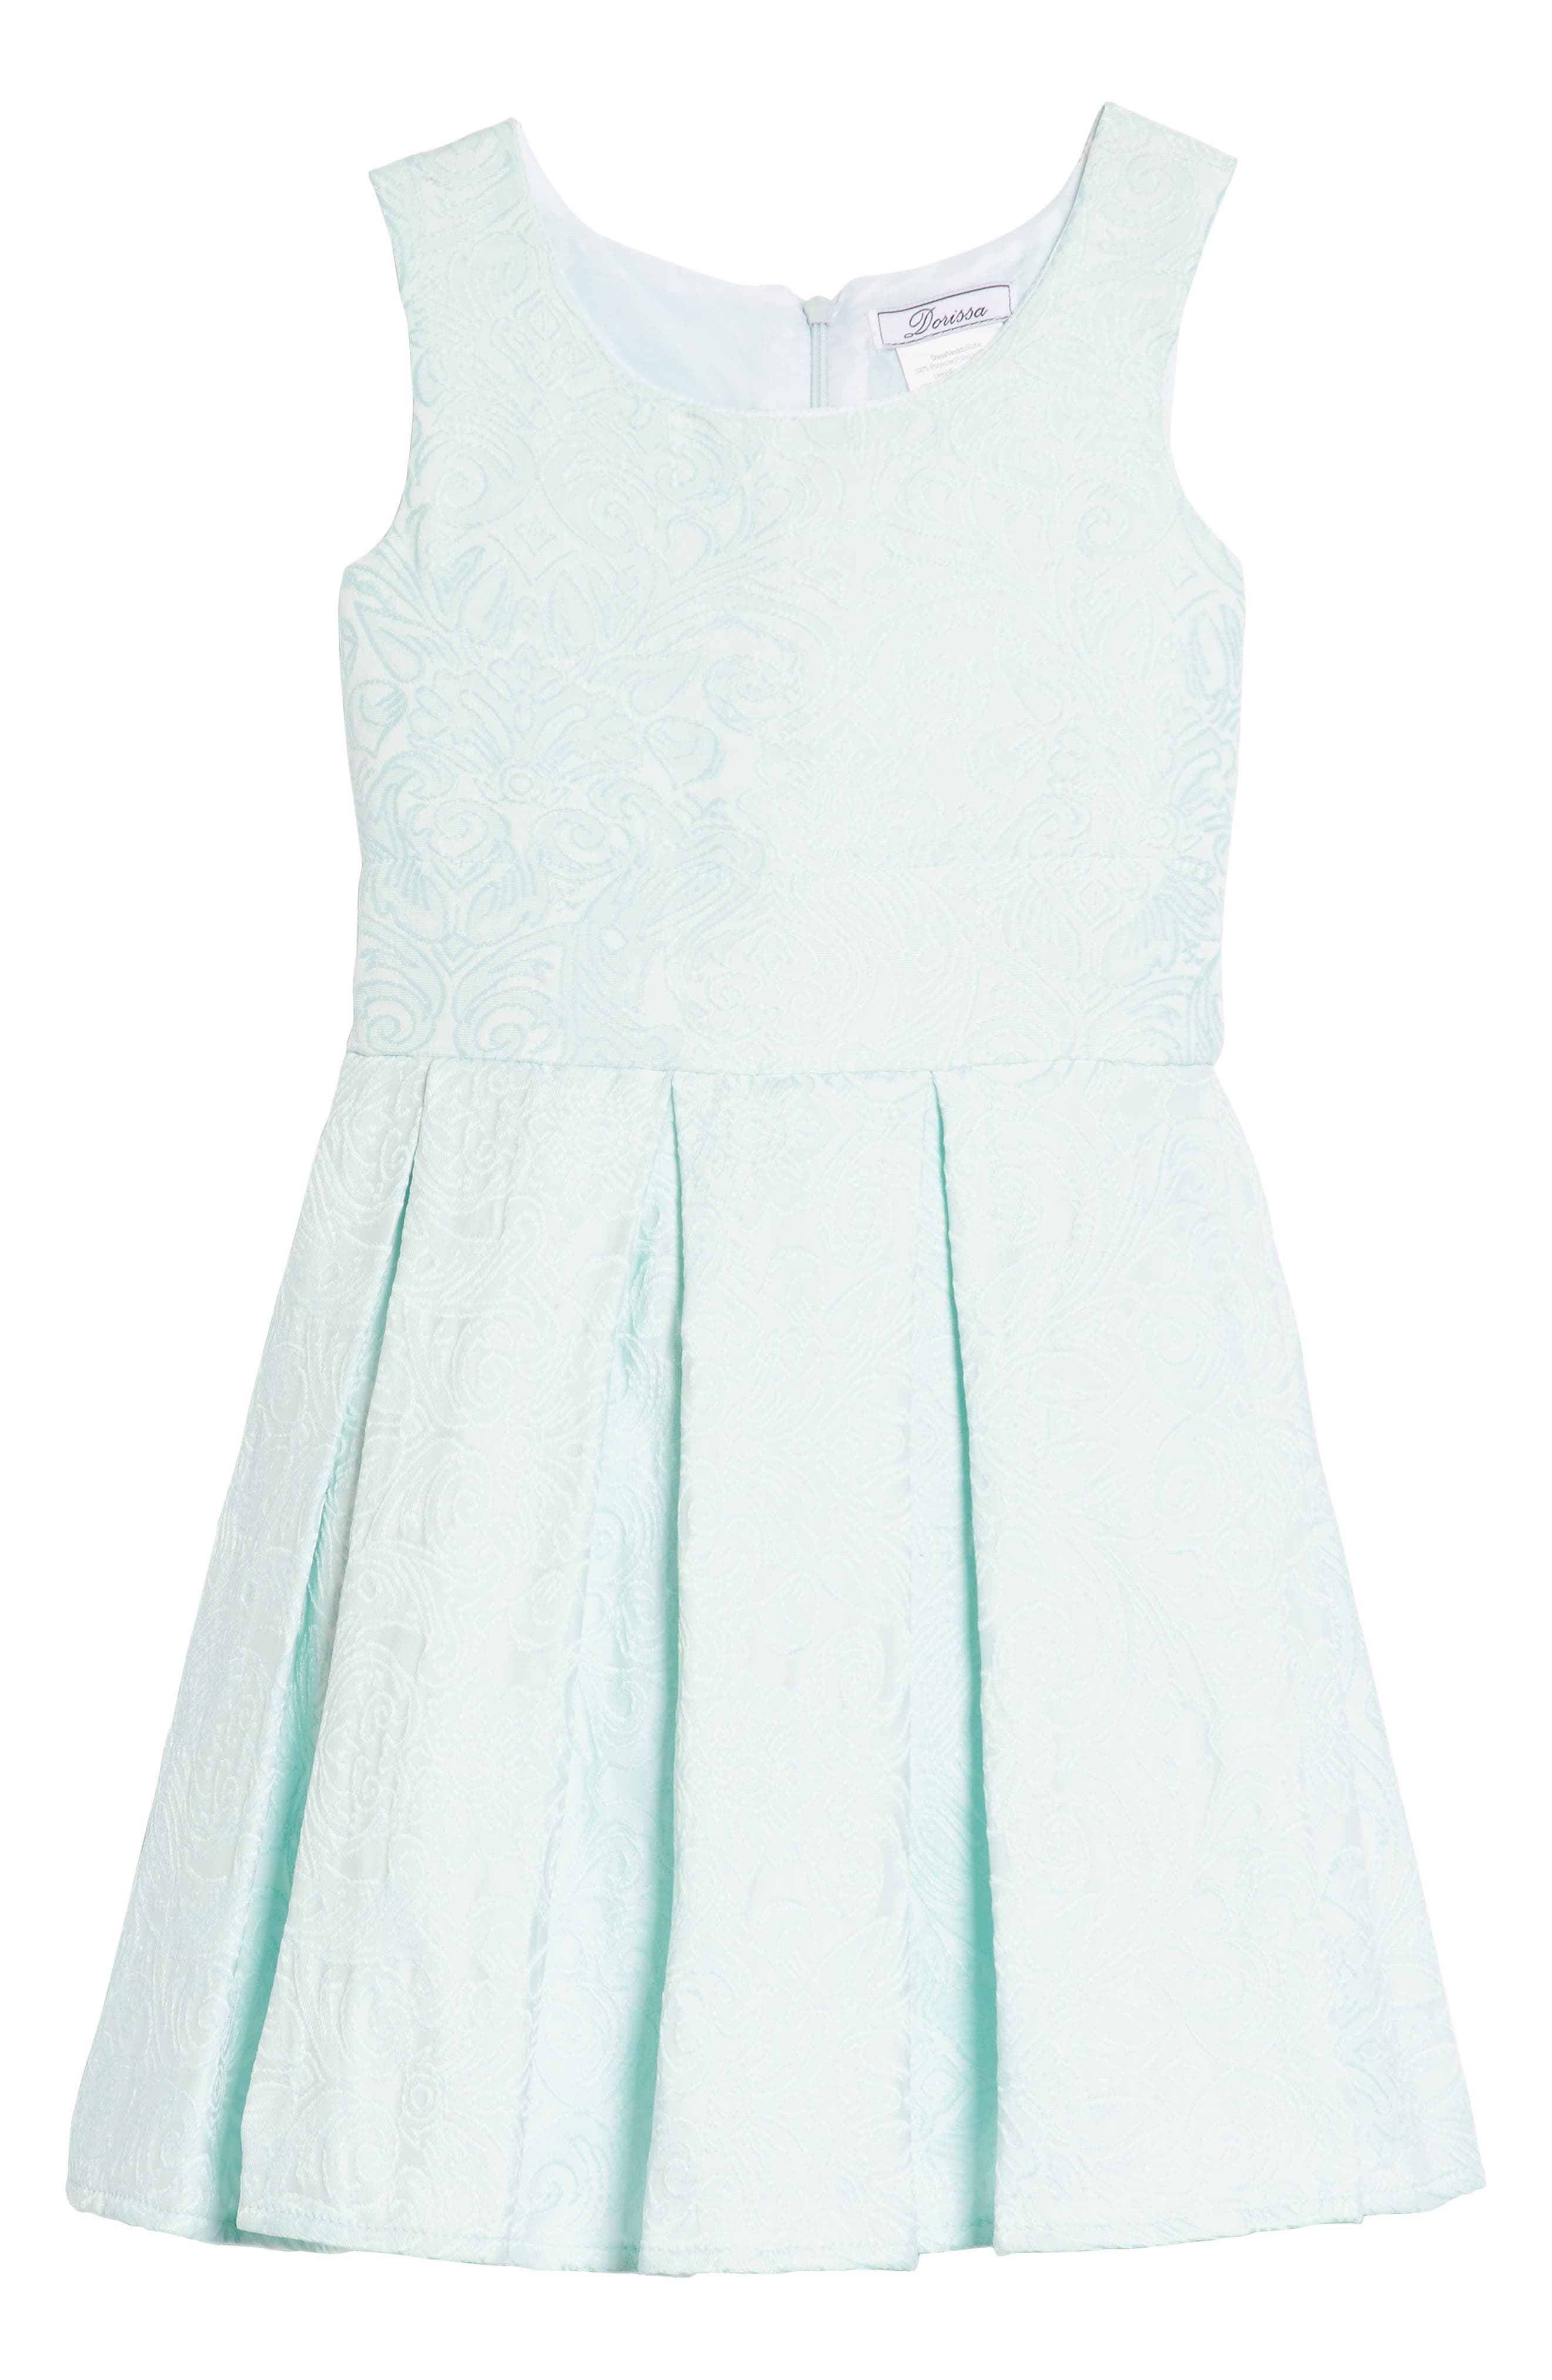 Megan Jacquard Dress,                         Main,                         color, 402